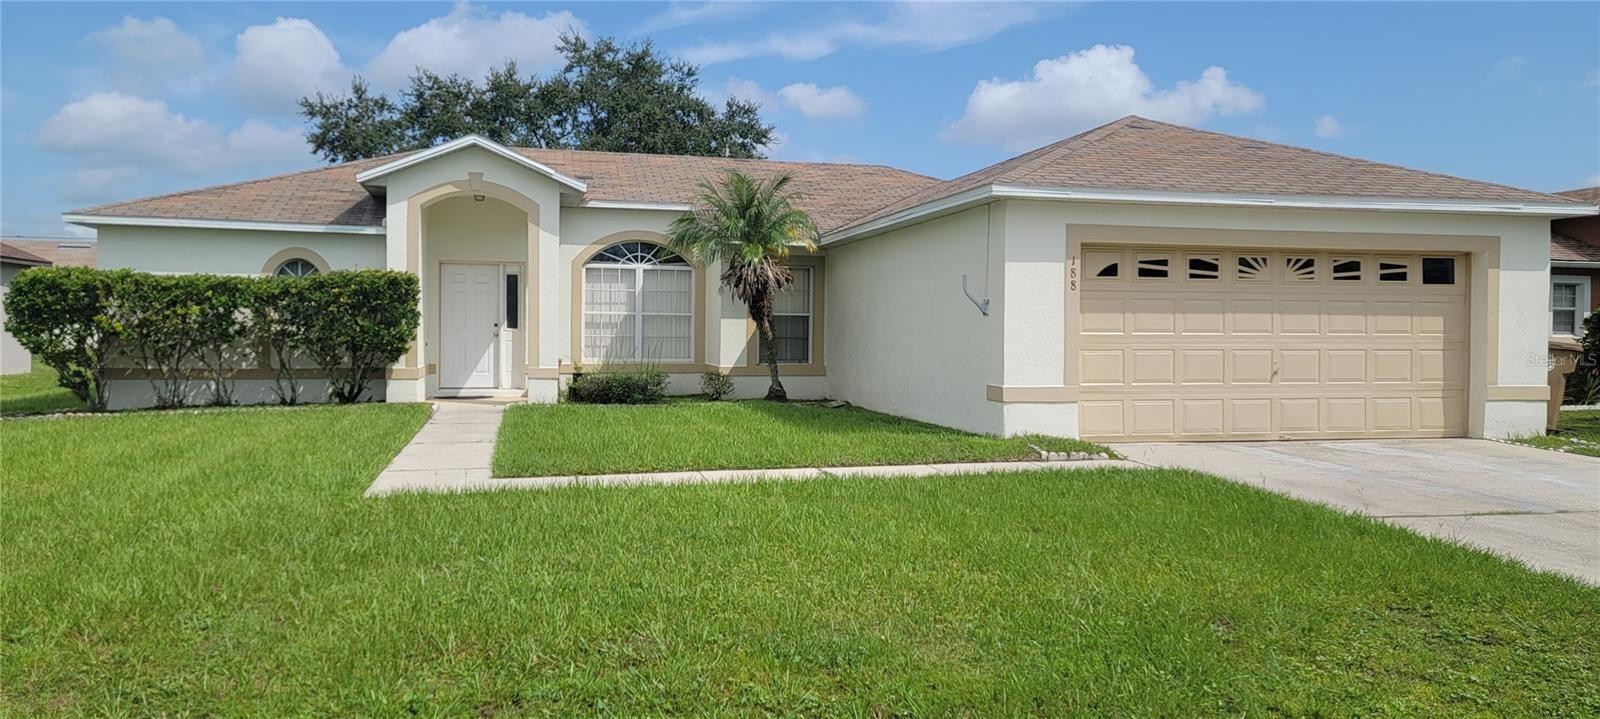 188 ANZIO DRIVE, Kissimmee, FL 34758 - #: S5056269